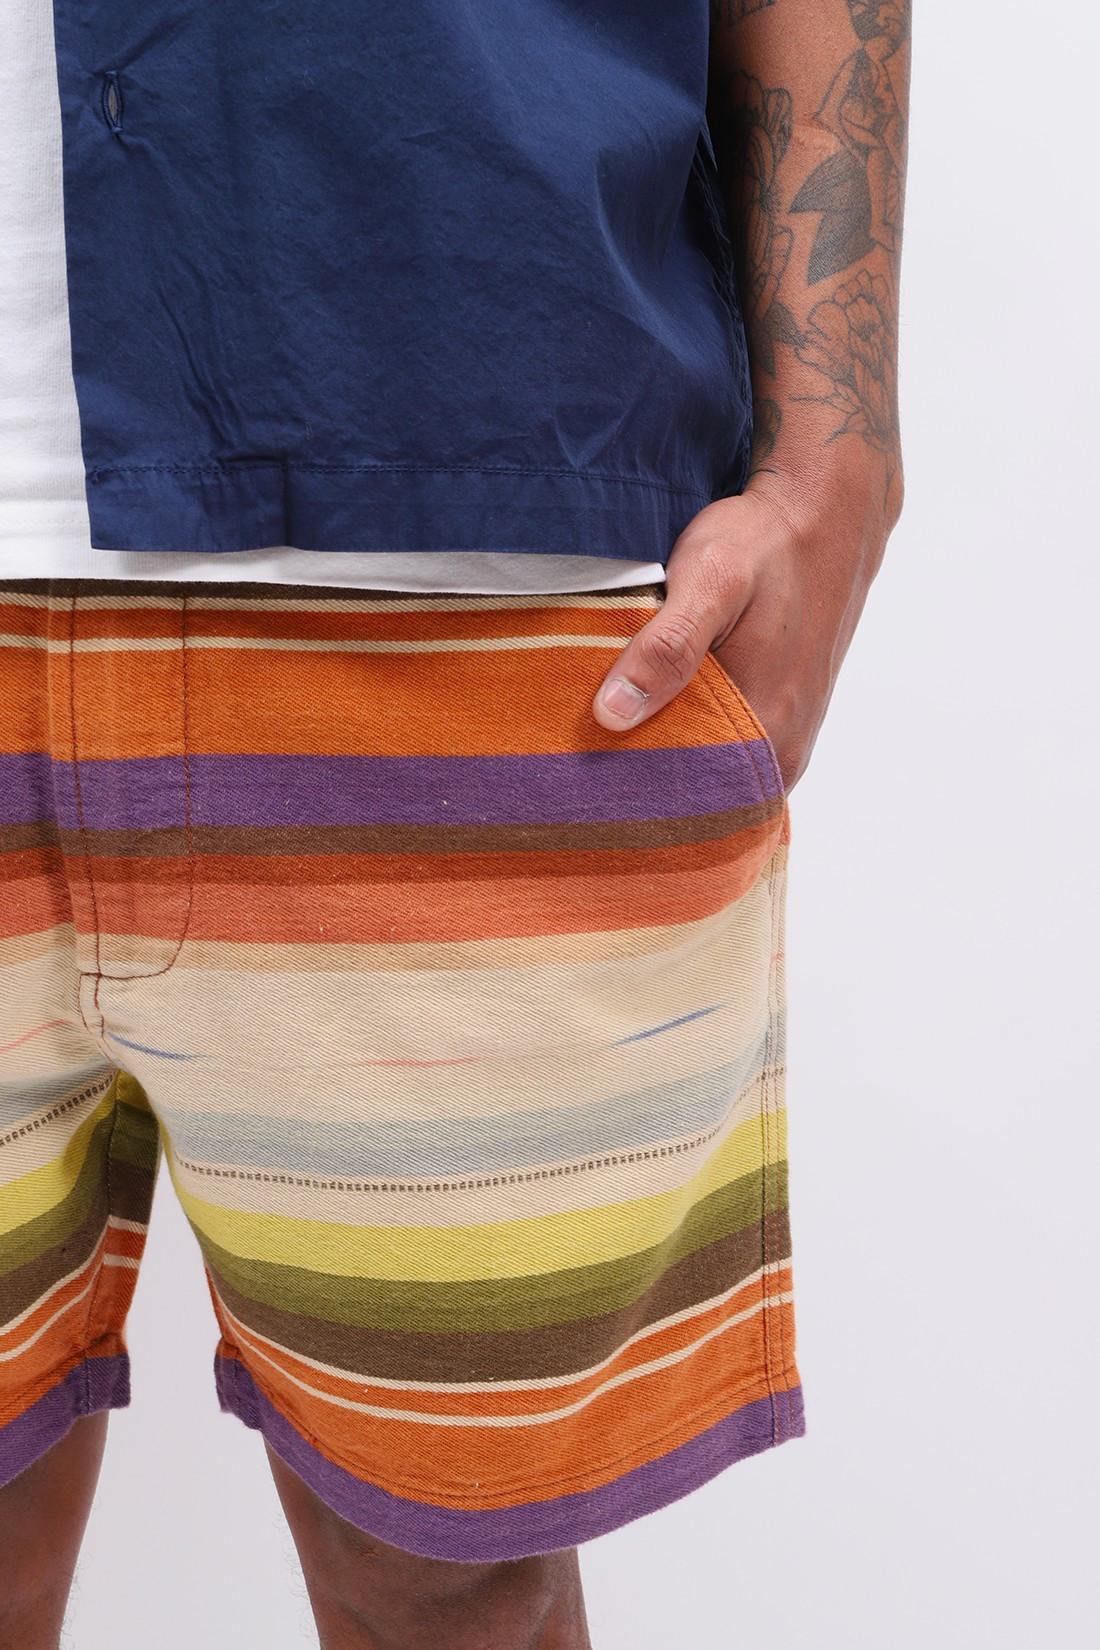 UNIVERSAL WORKS / Track short mex blanket Multi stripe